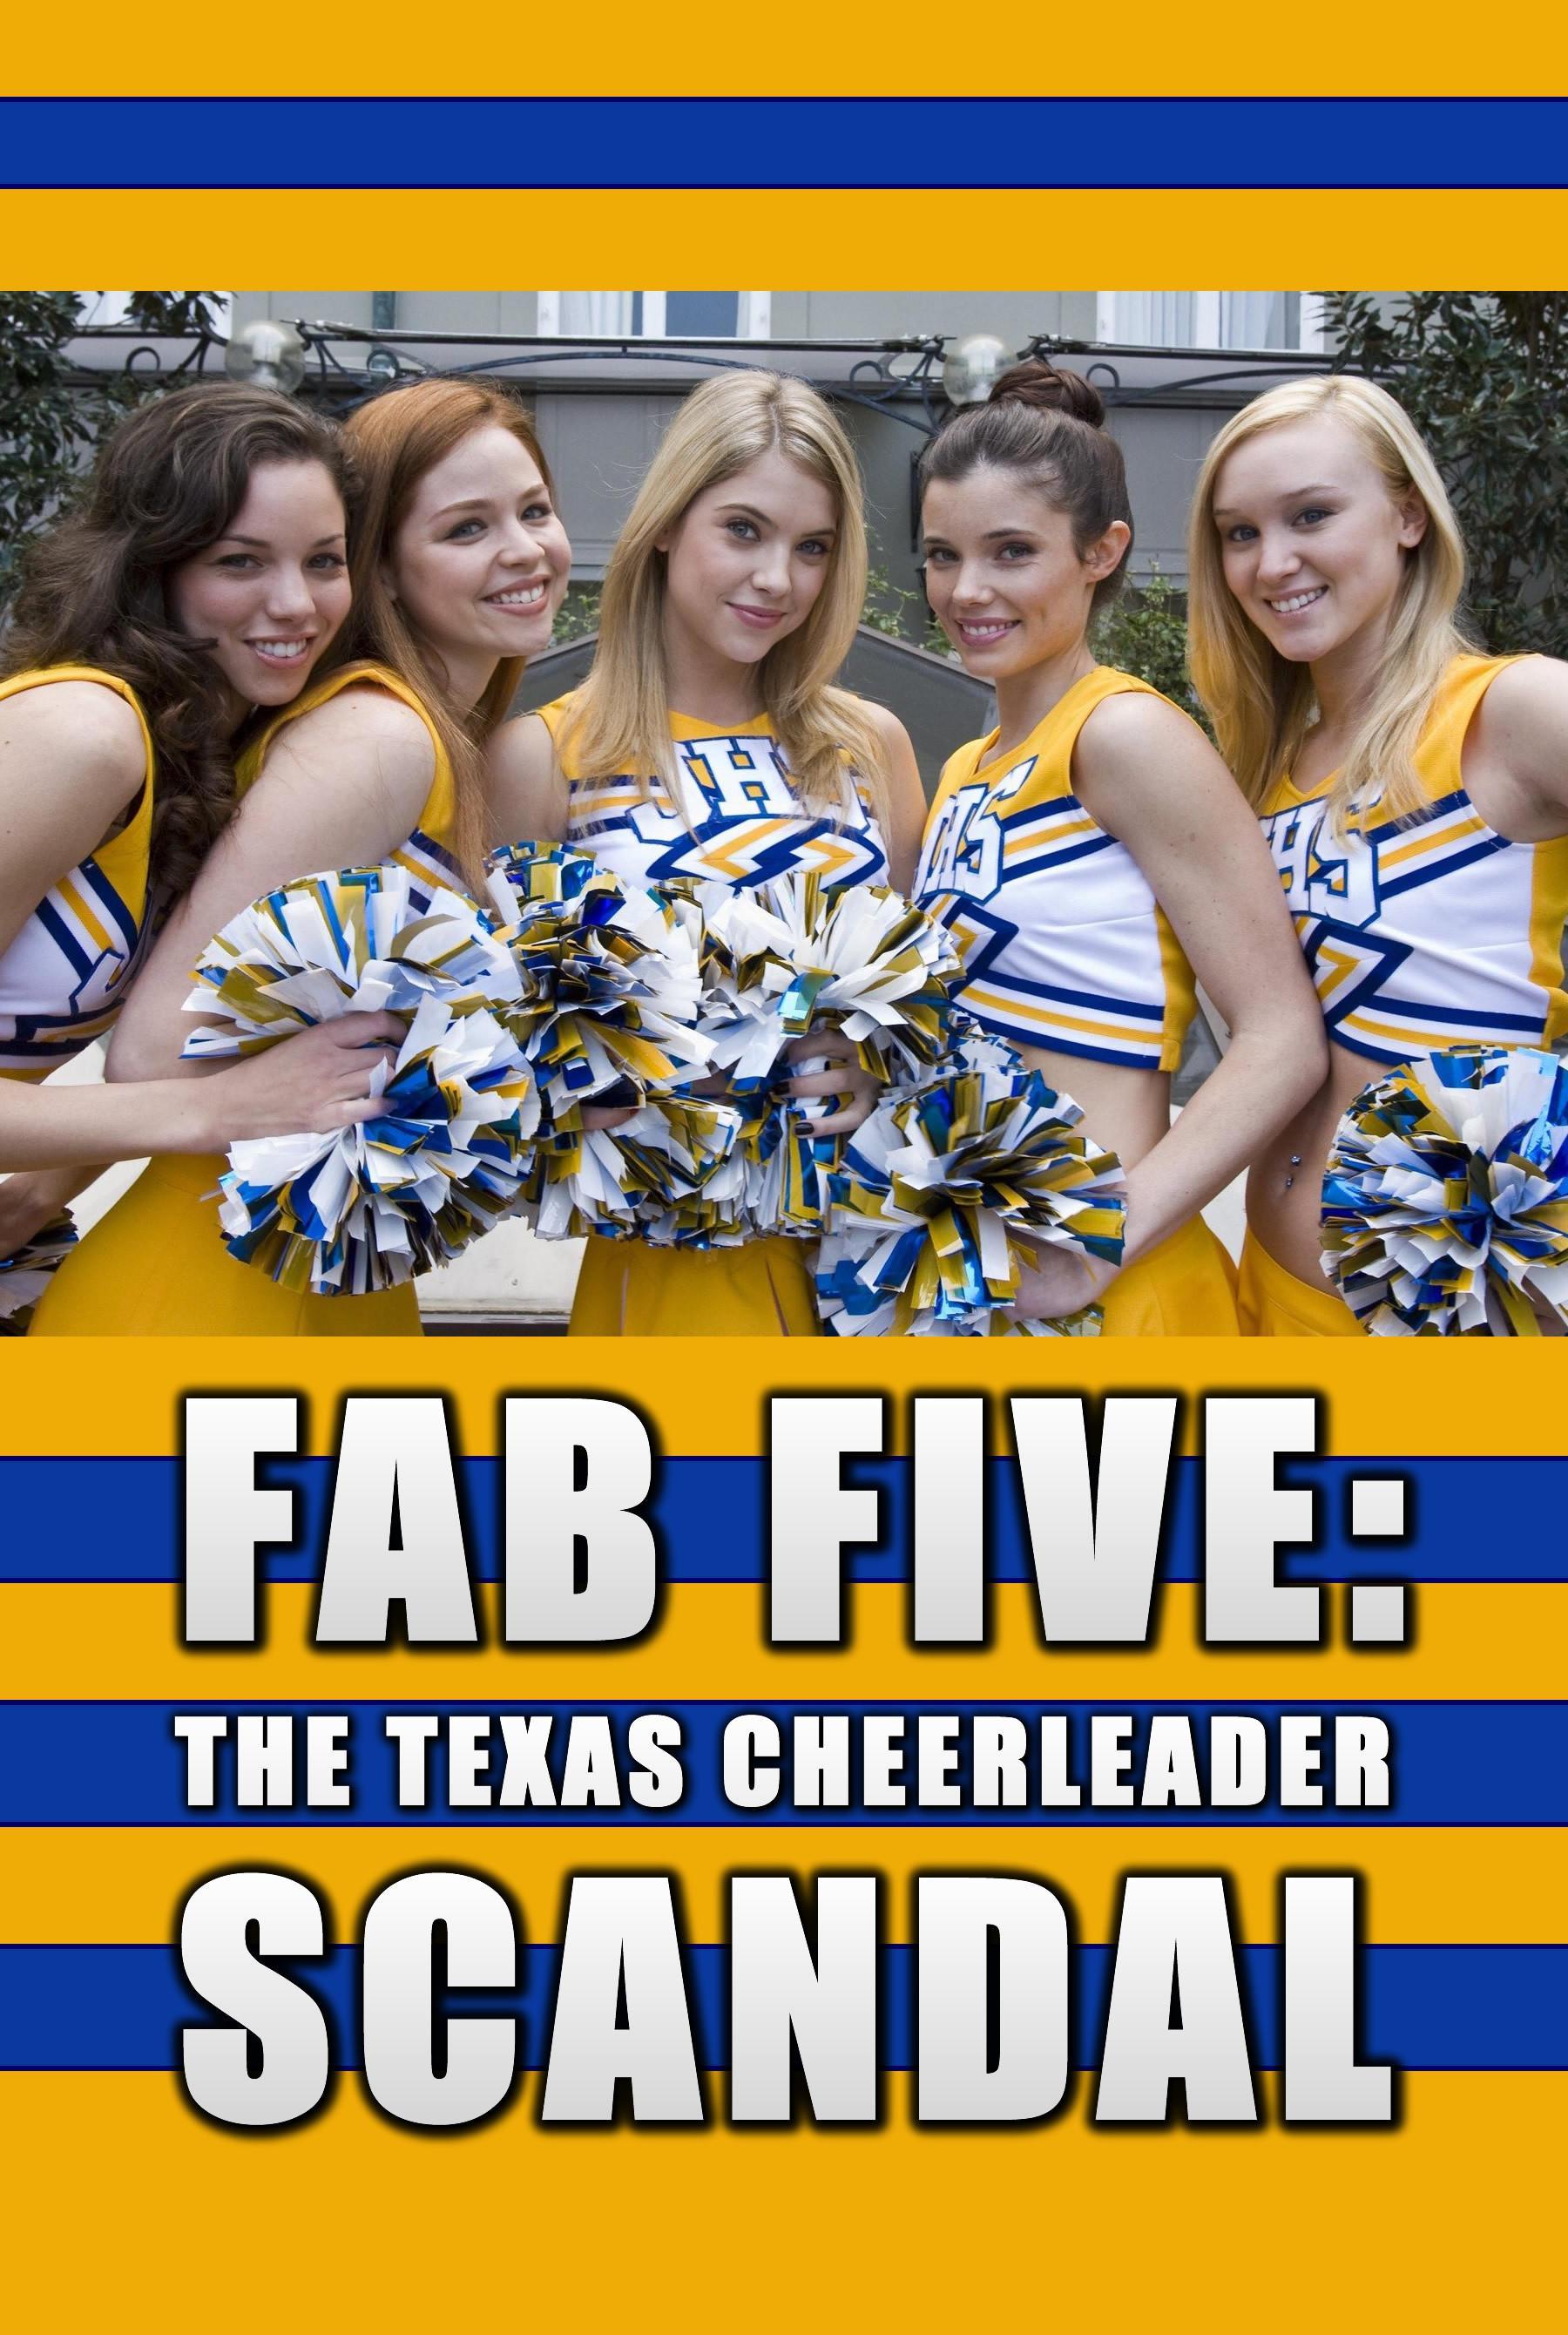 The Texas Cheerleader Scandal Story